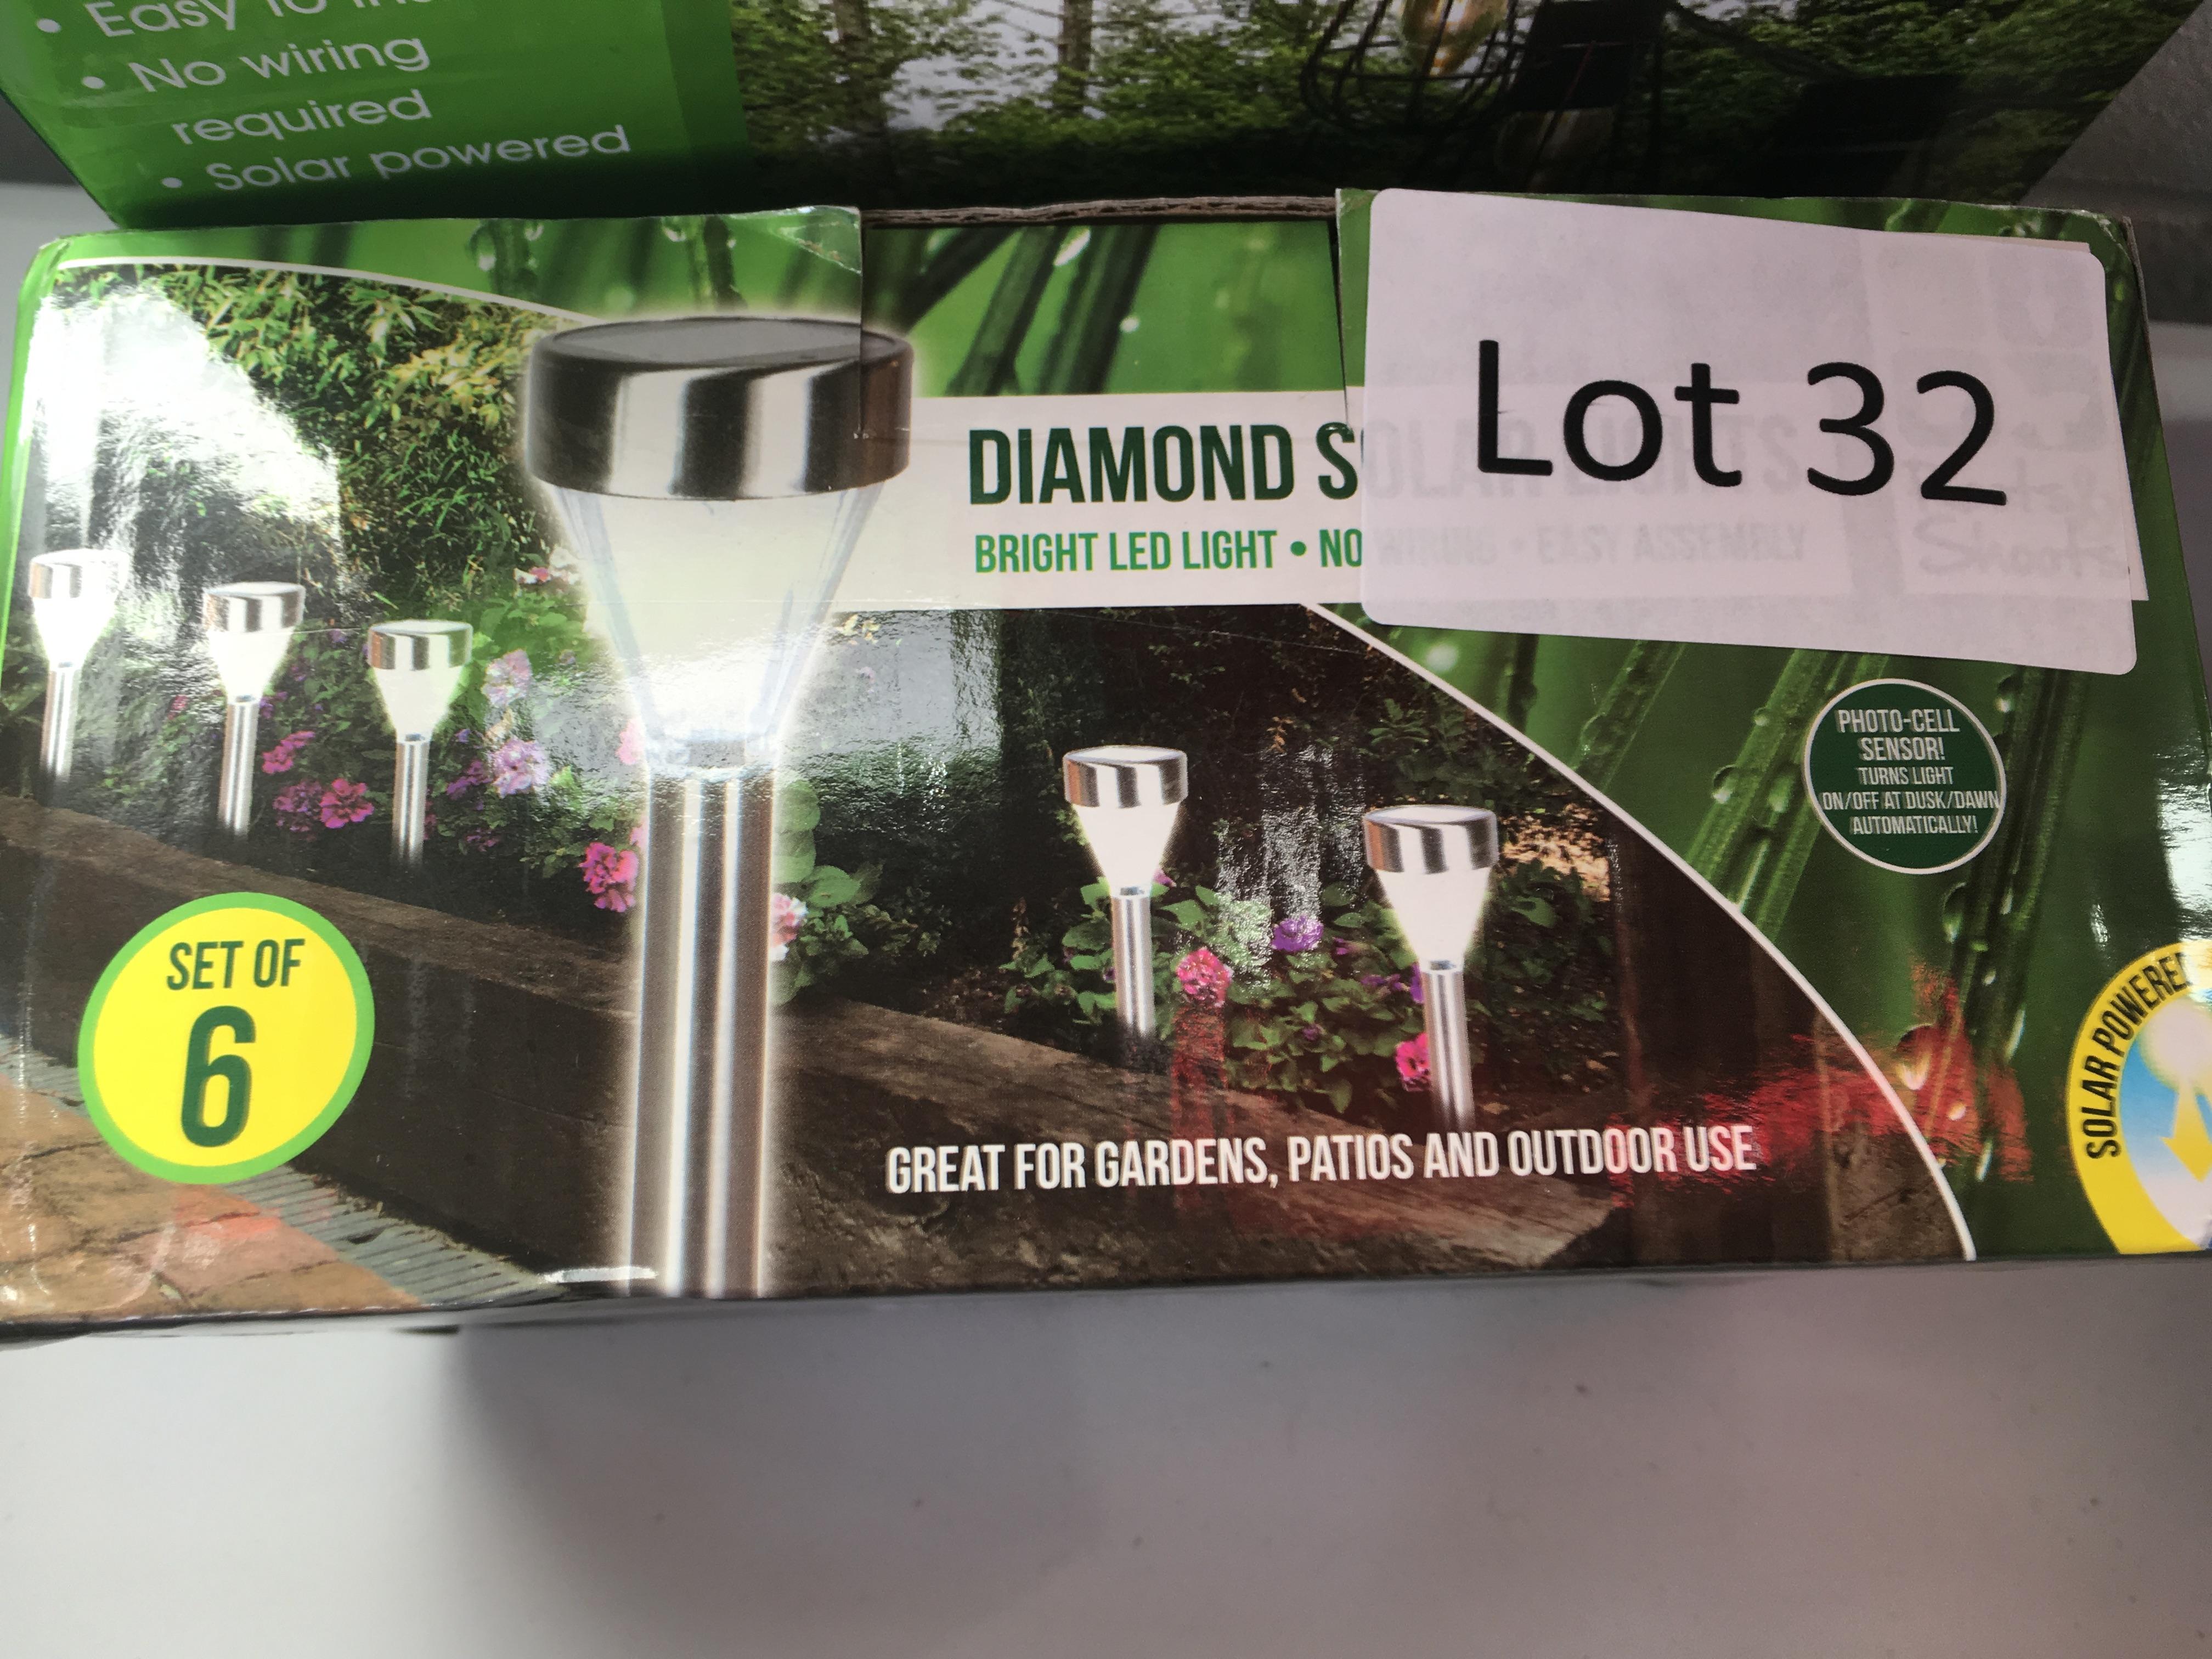 Lot 32 - Set of 6 diamond solar lights. Bad packaging.